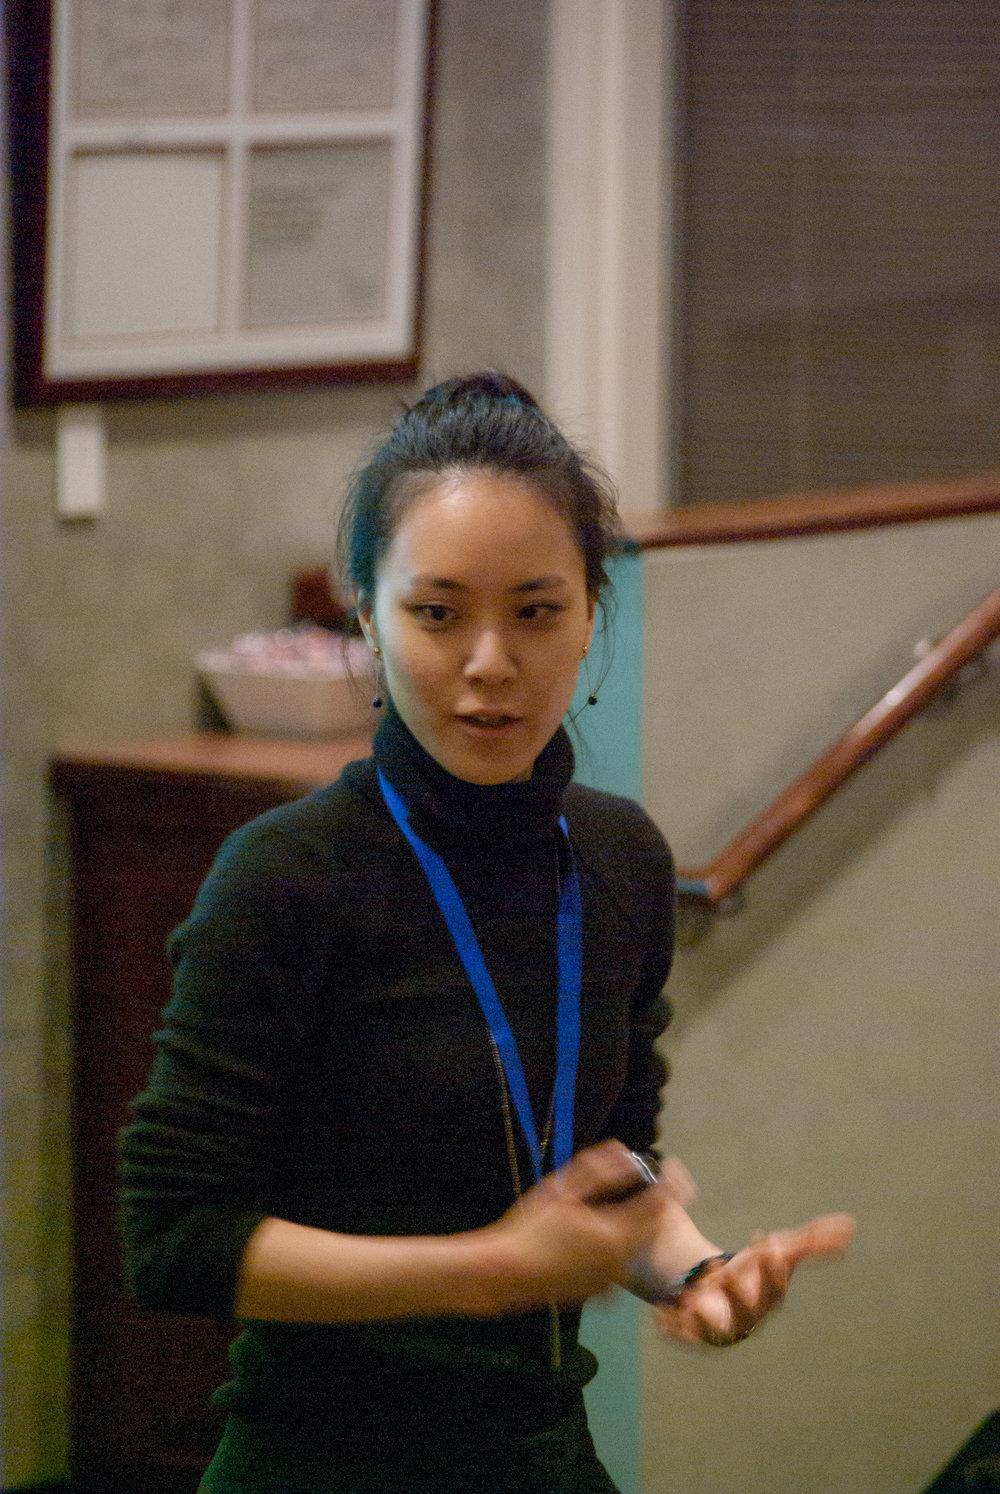 keynote speaker: professor soo kim, cornell johnson school of management (marketing)